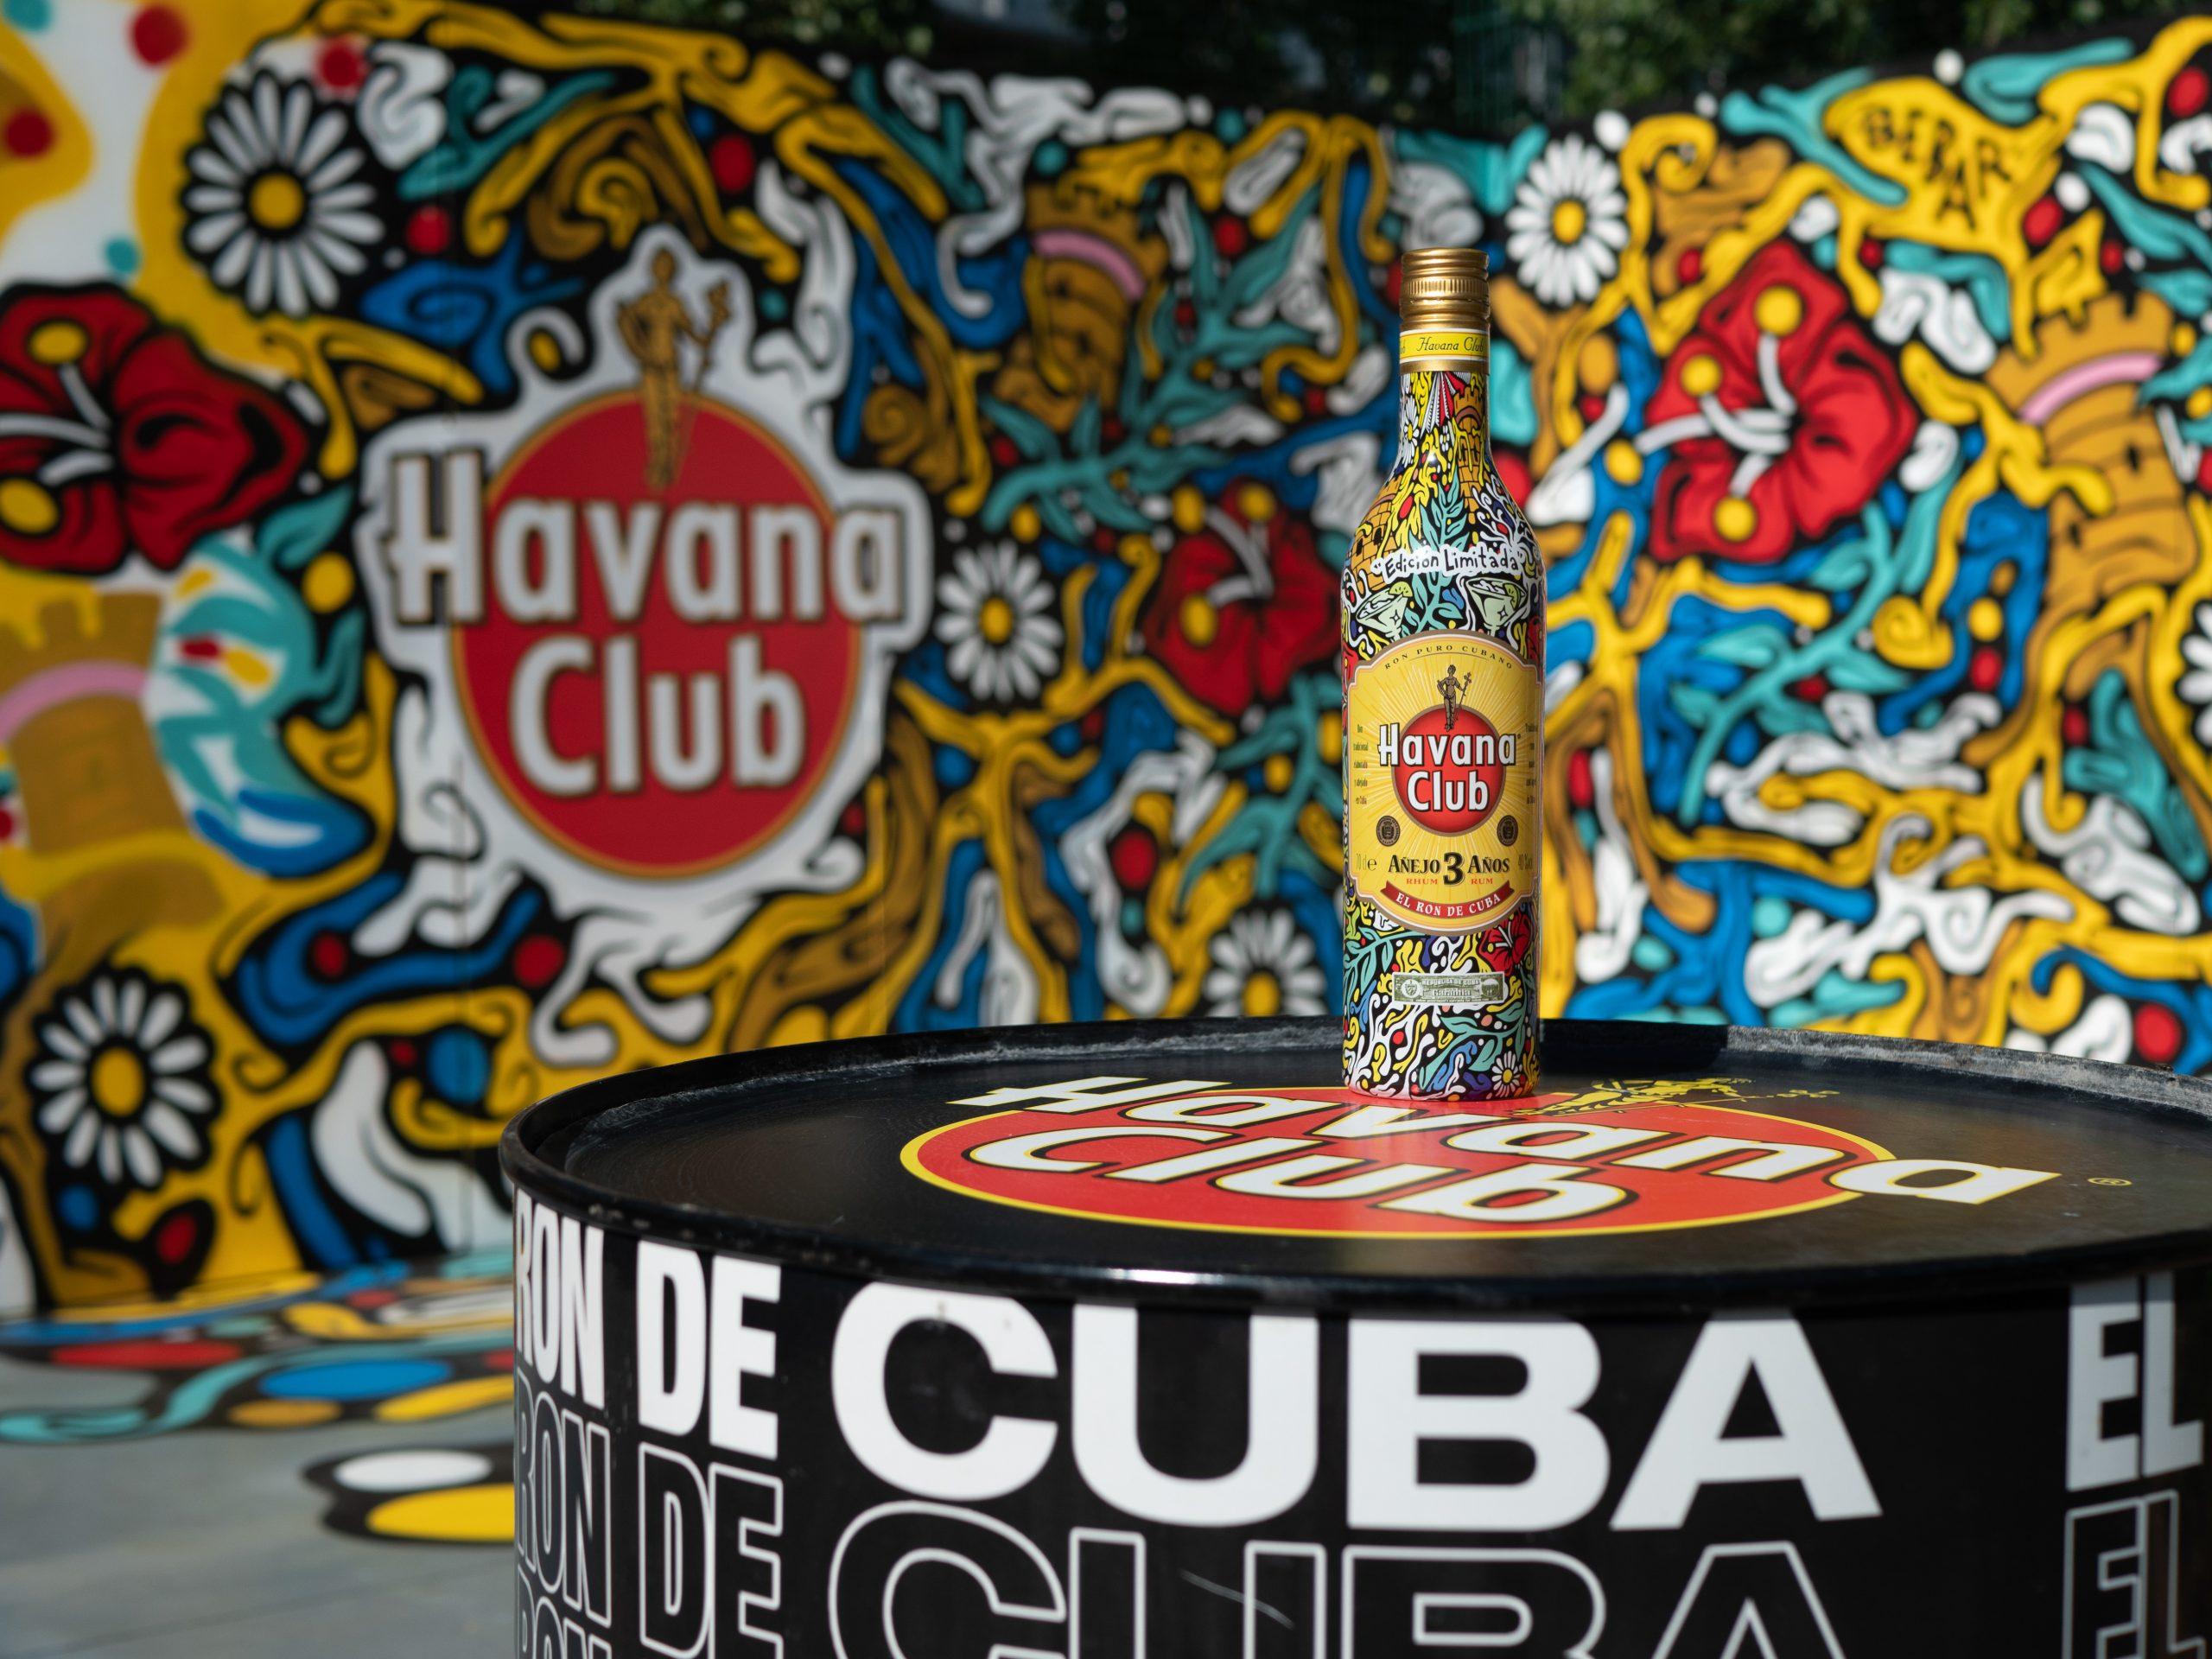 BEBAR x HAVANA CLUB BANNIERE